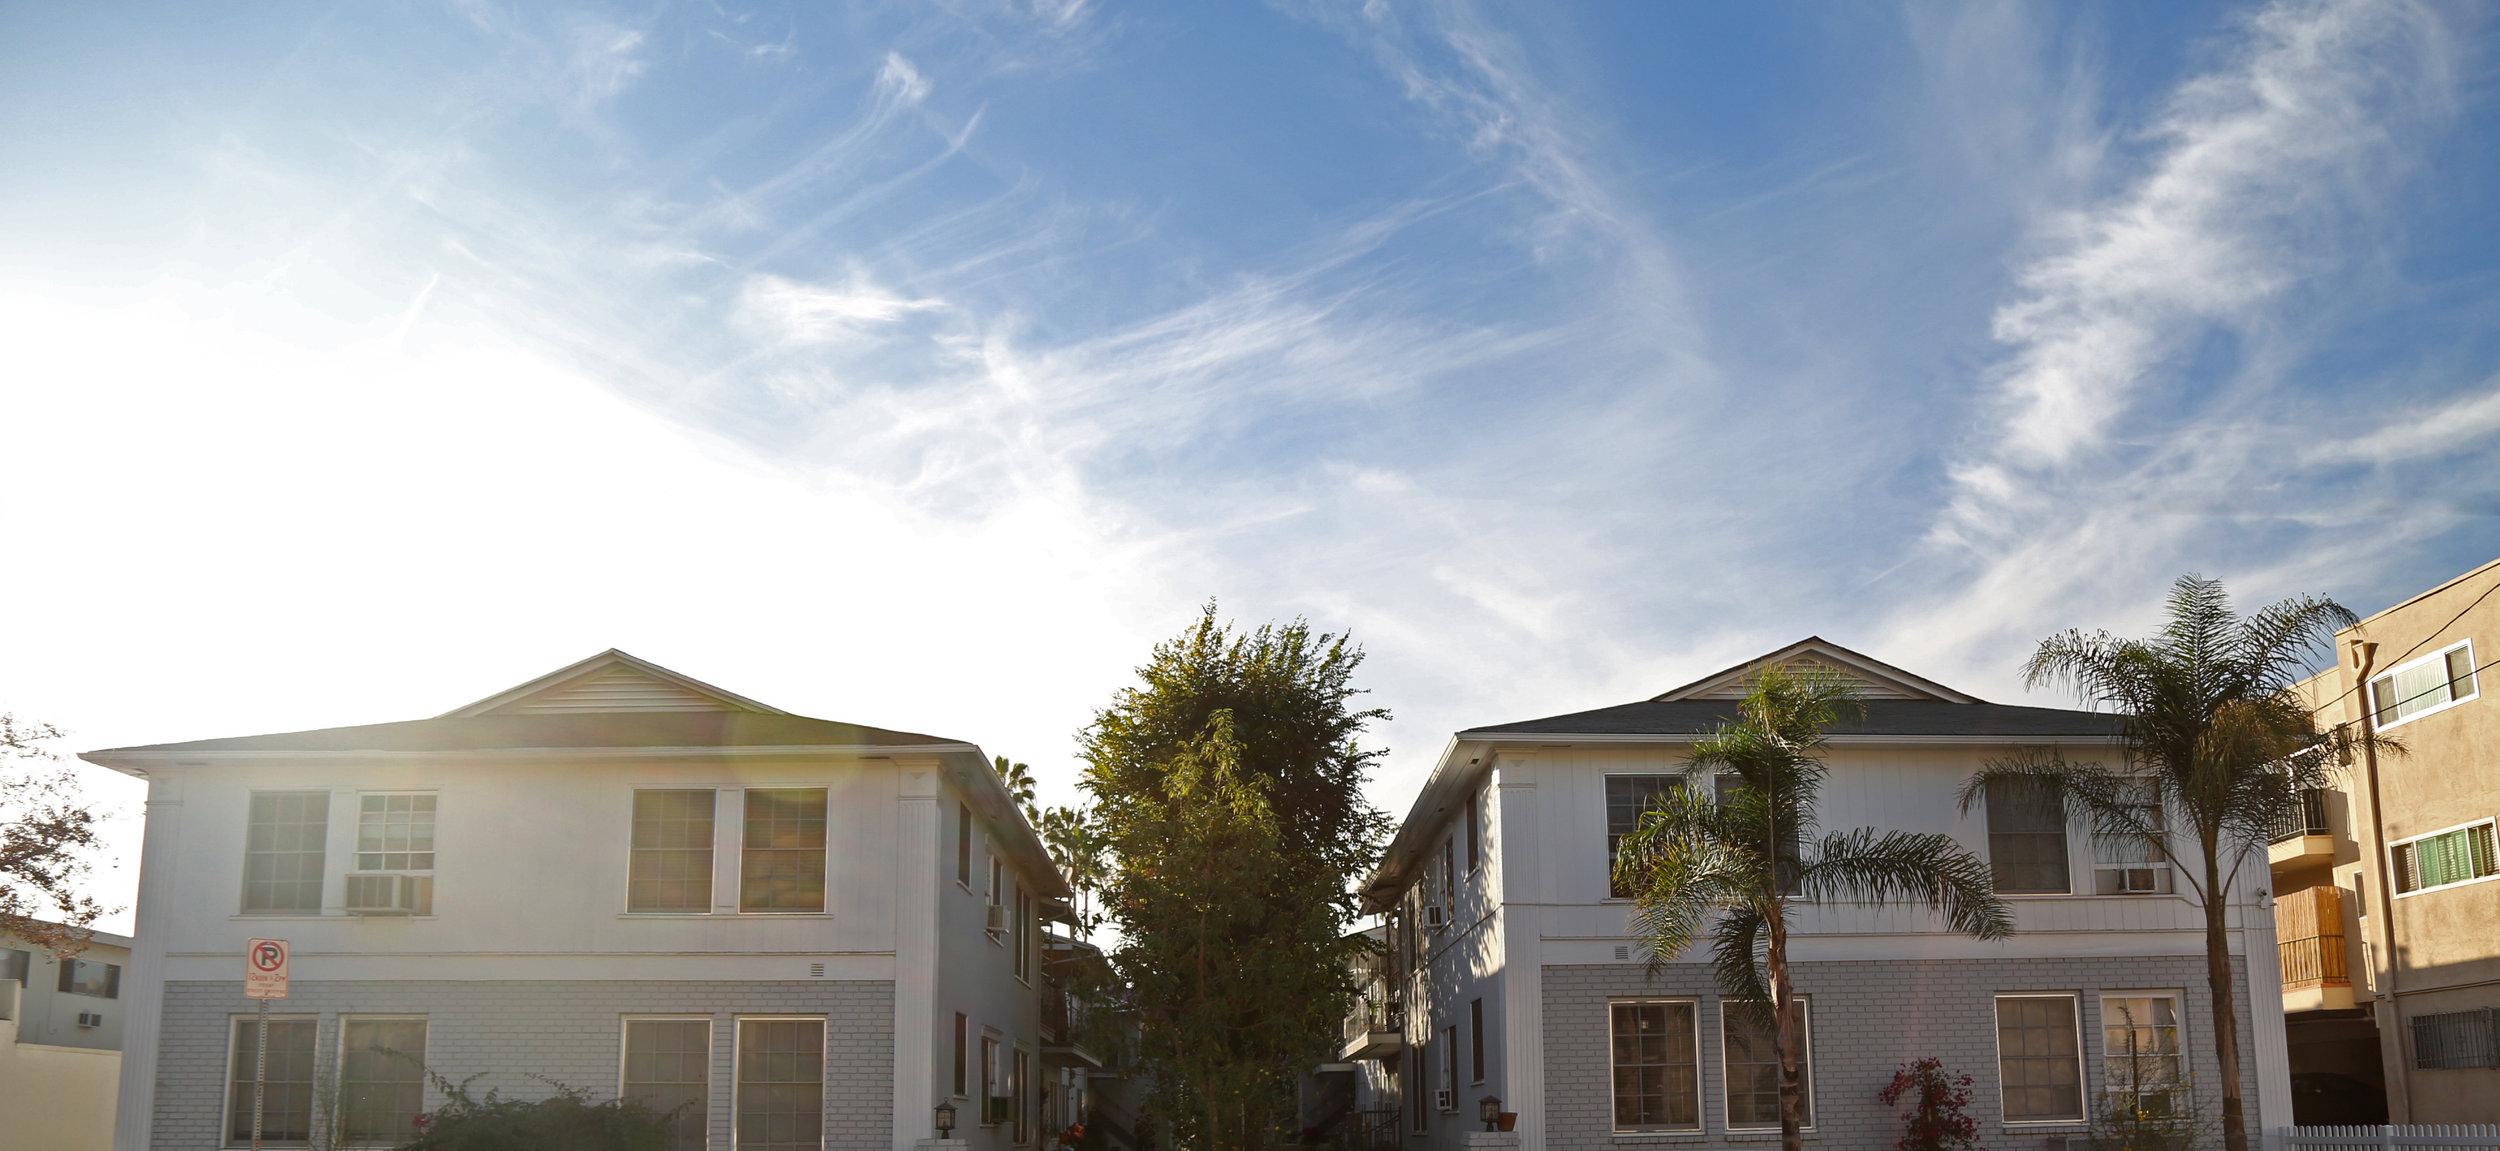 Fisch Properties - Residential - Apartments - Los Angeles.jpg